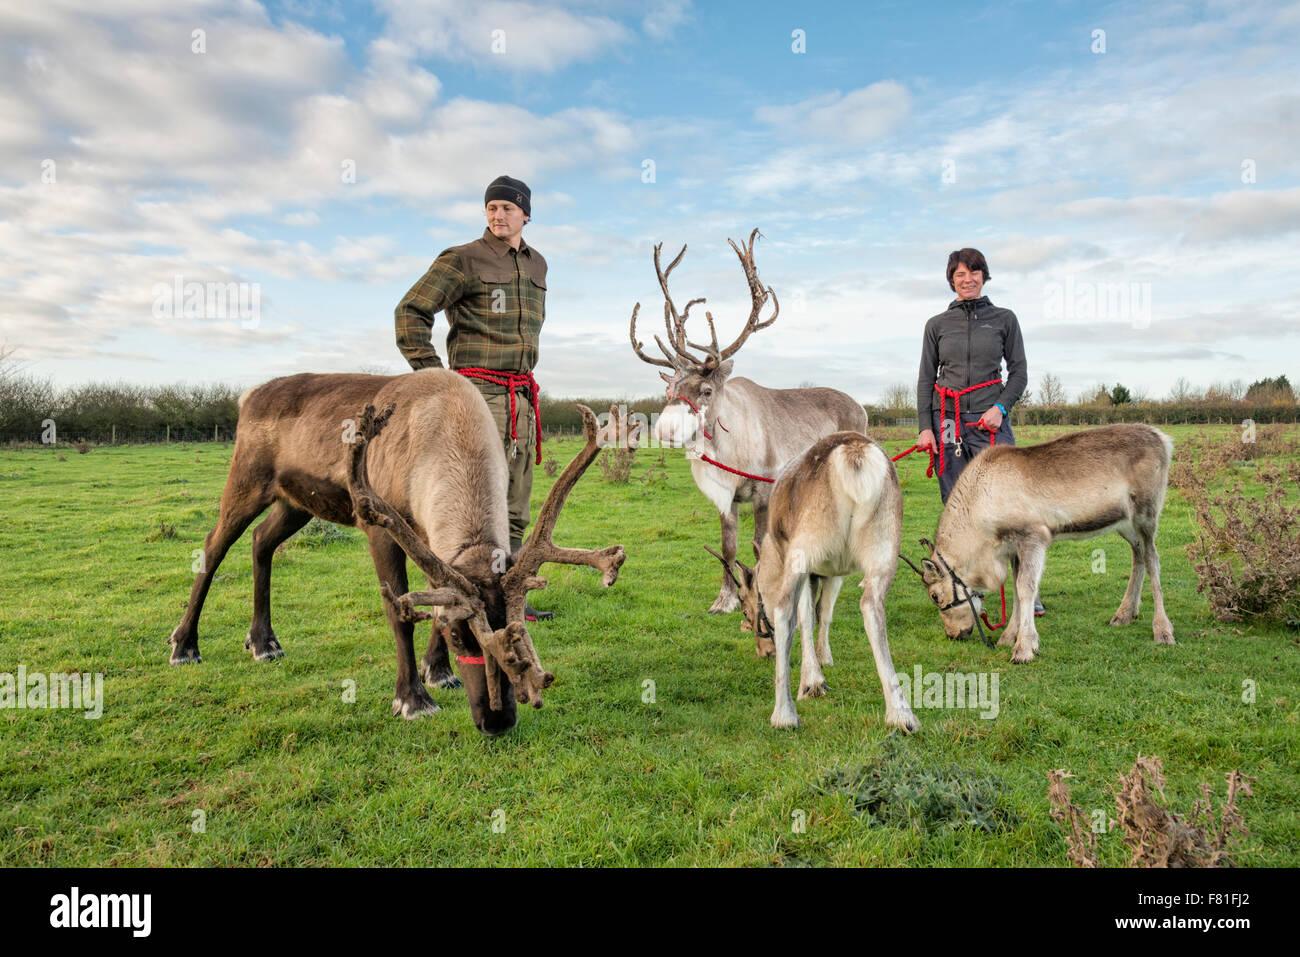 Barton, Cambridgeshire, UK.  4th December 2015, Alex Smith and Leonie Palmer exercise reindeer at Bird's Farm, Barton - Stock Image